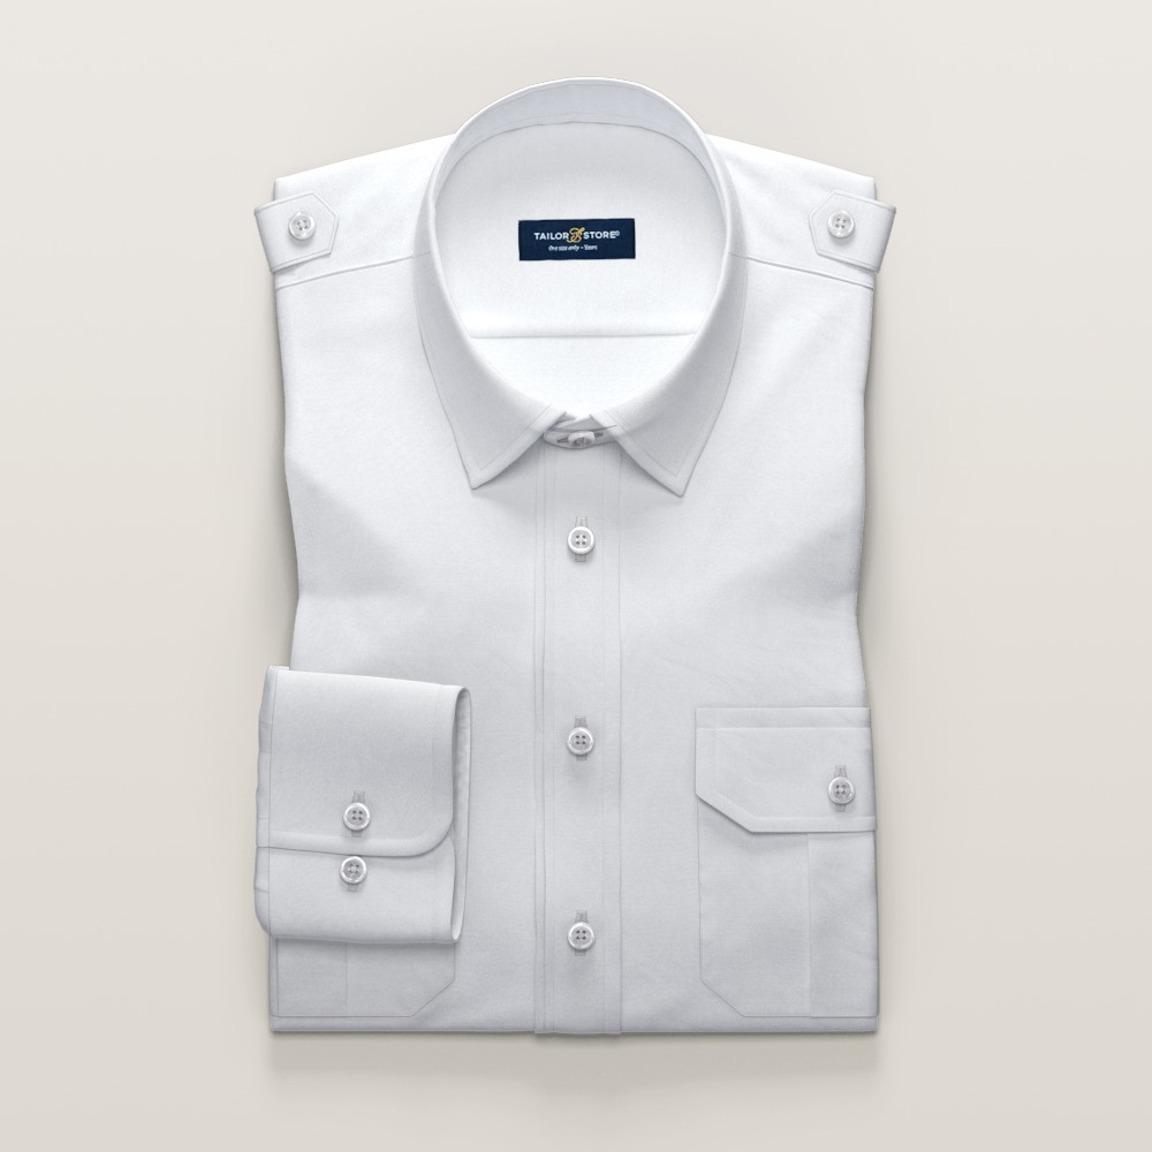 White women's pilot shirt